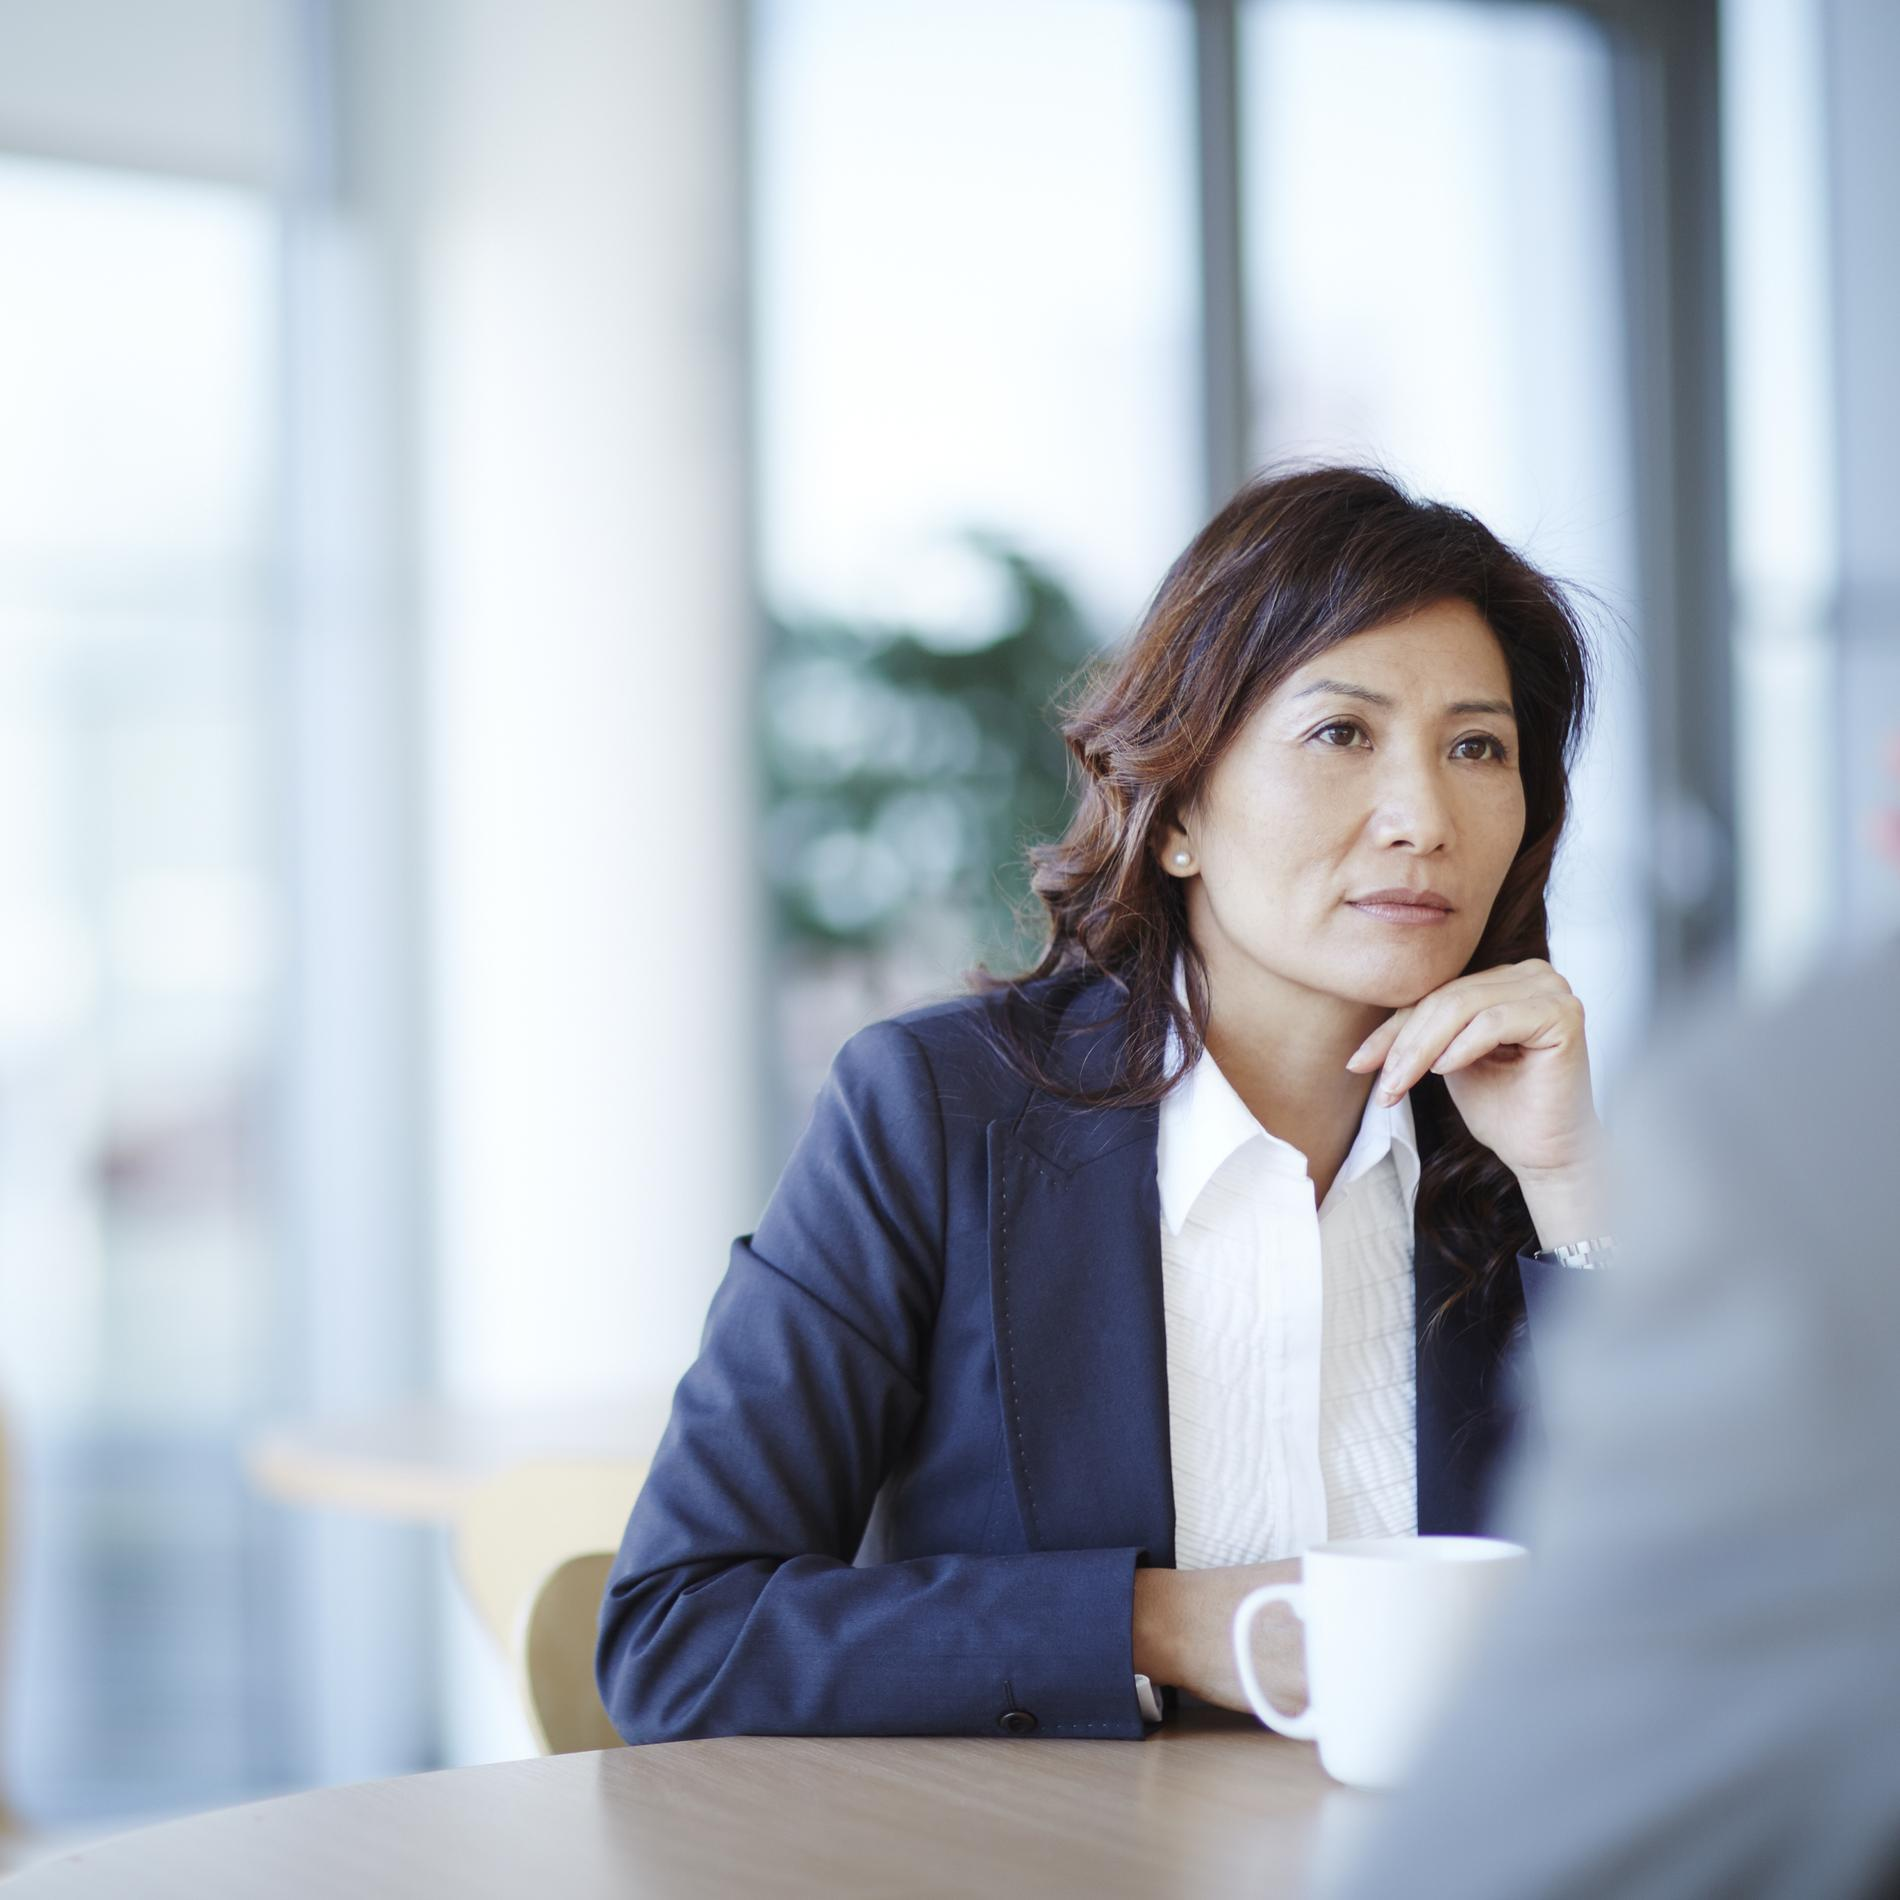 femme 55 ans cherche emploi)